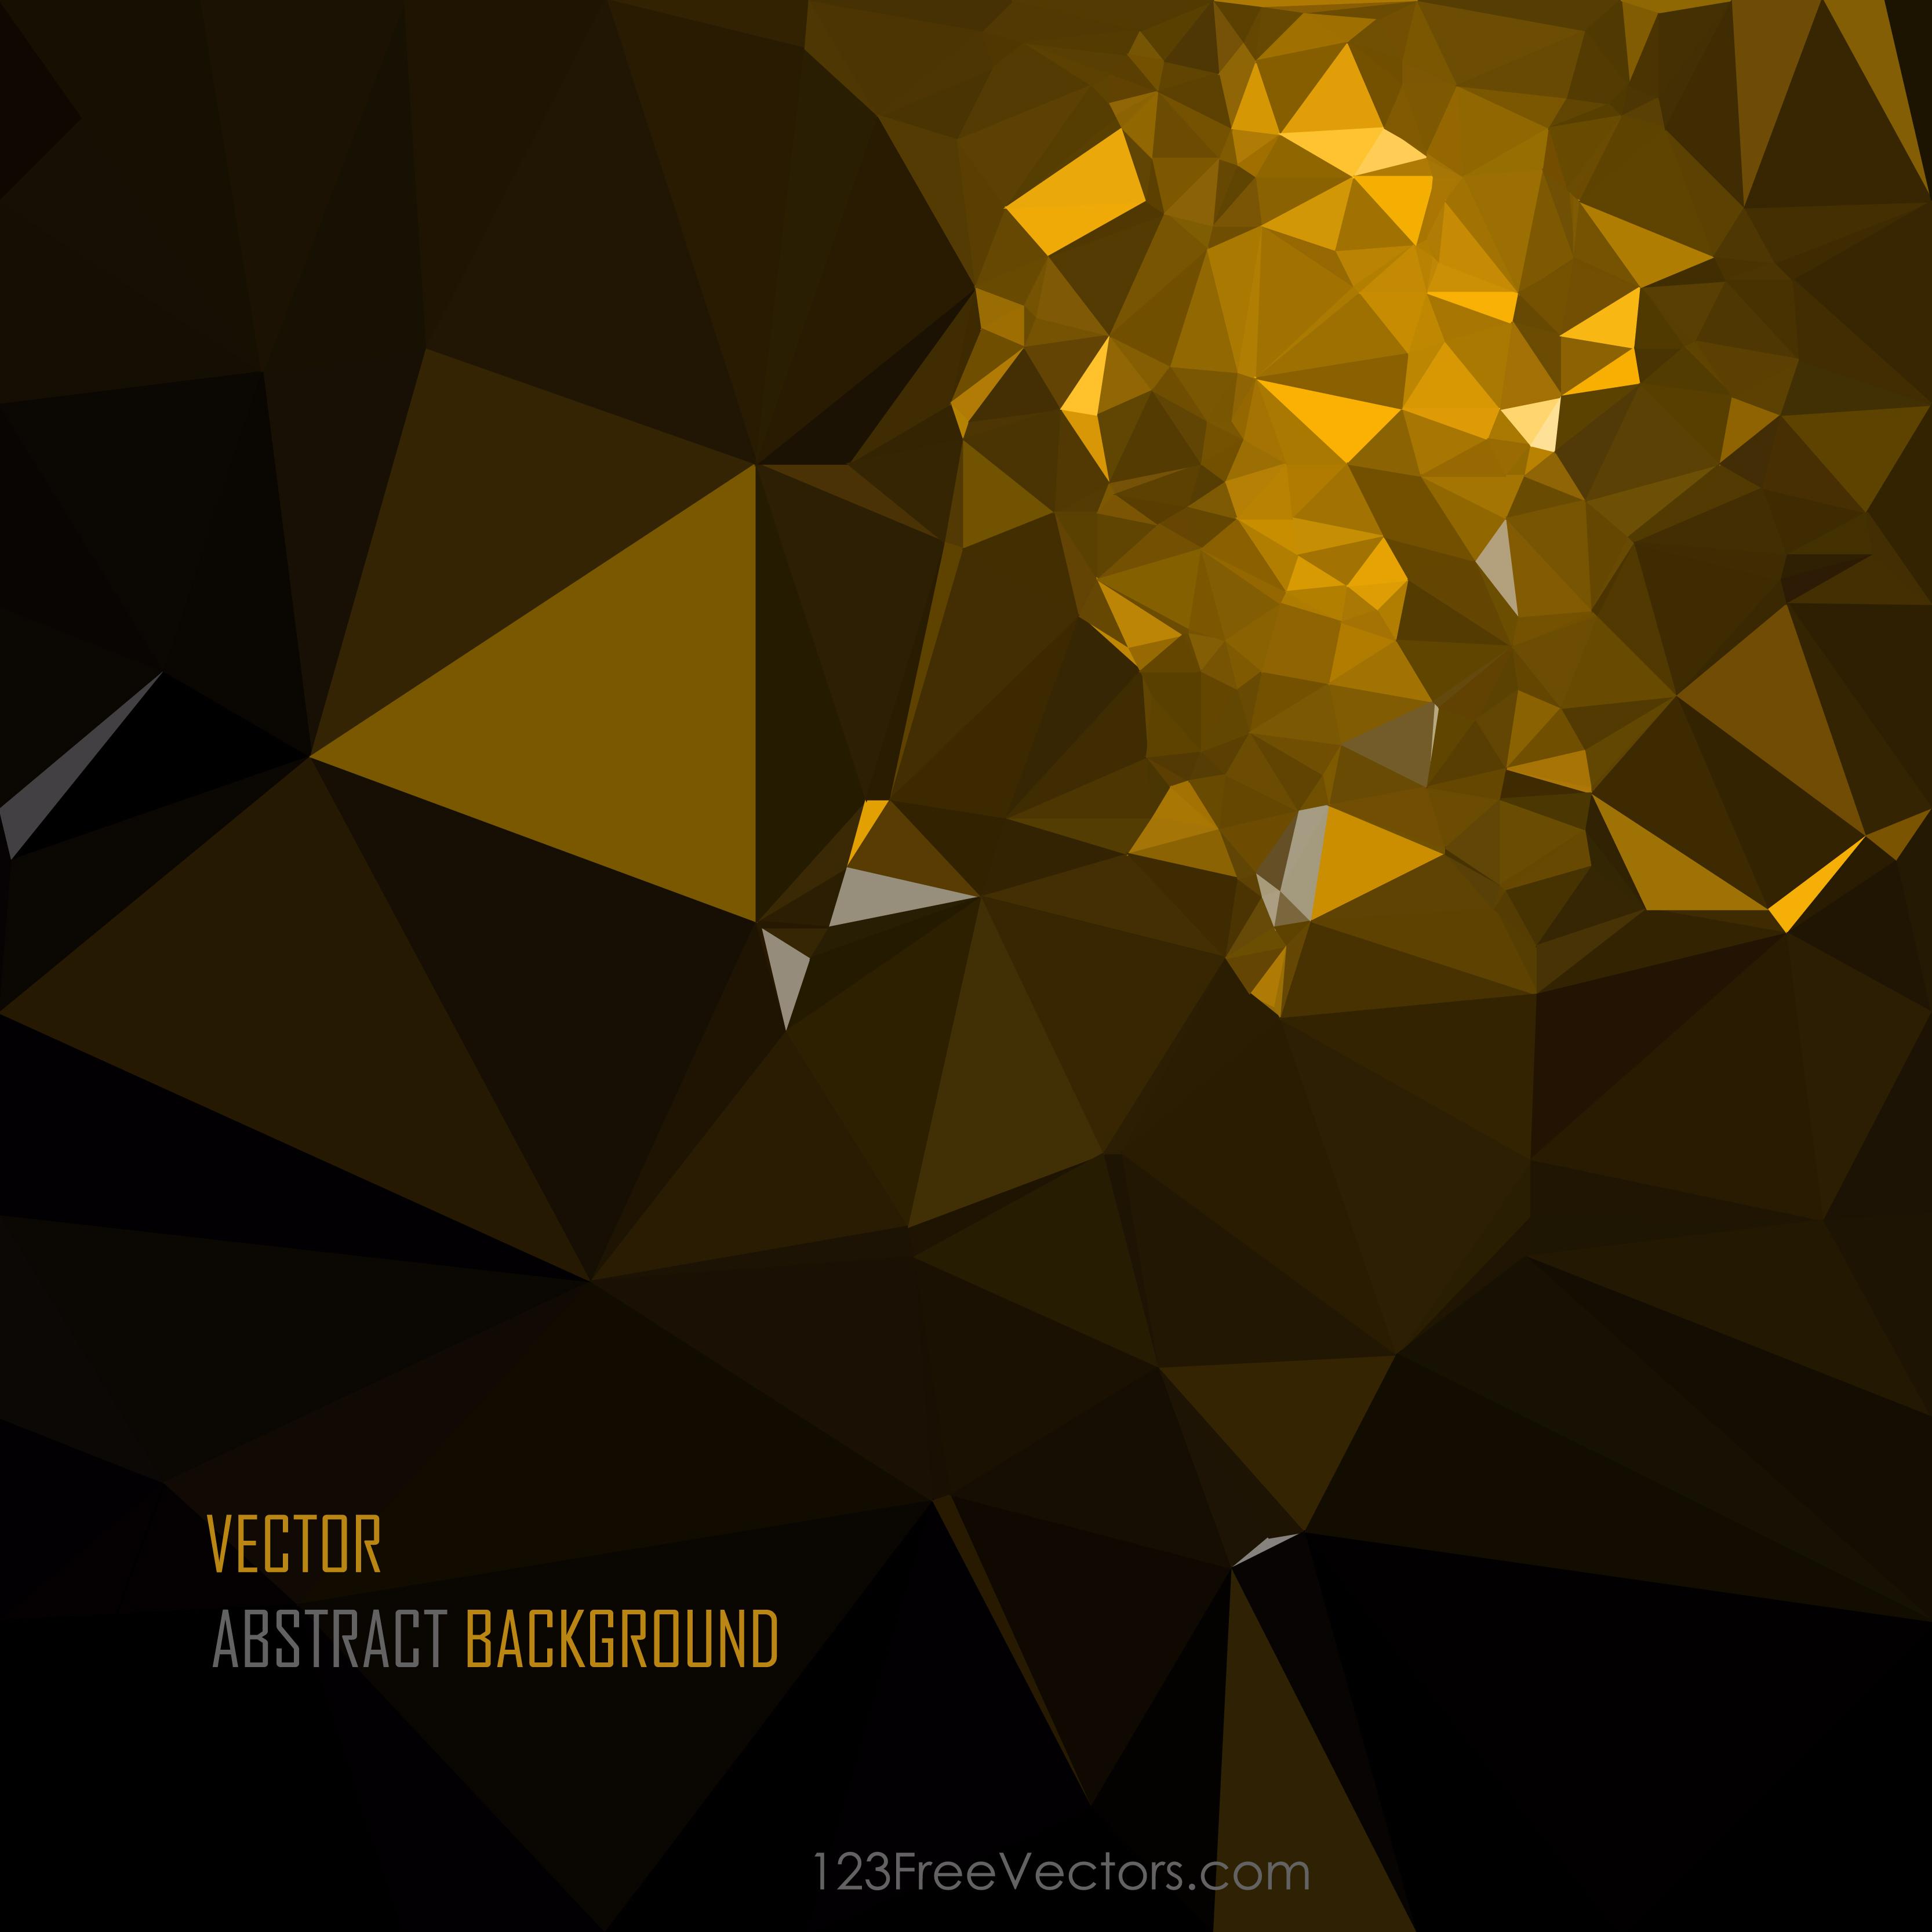 910+ cool backgrounds vectors | download free vector art & graphics